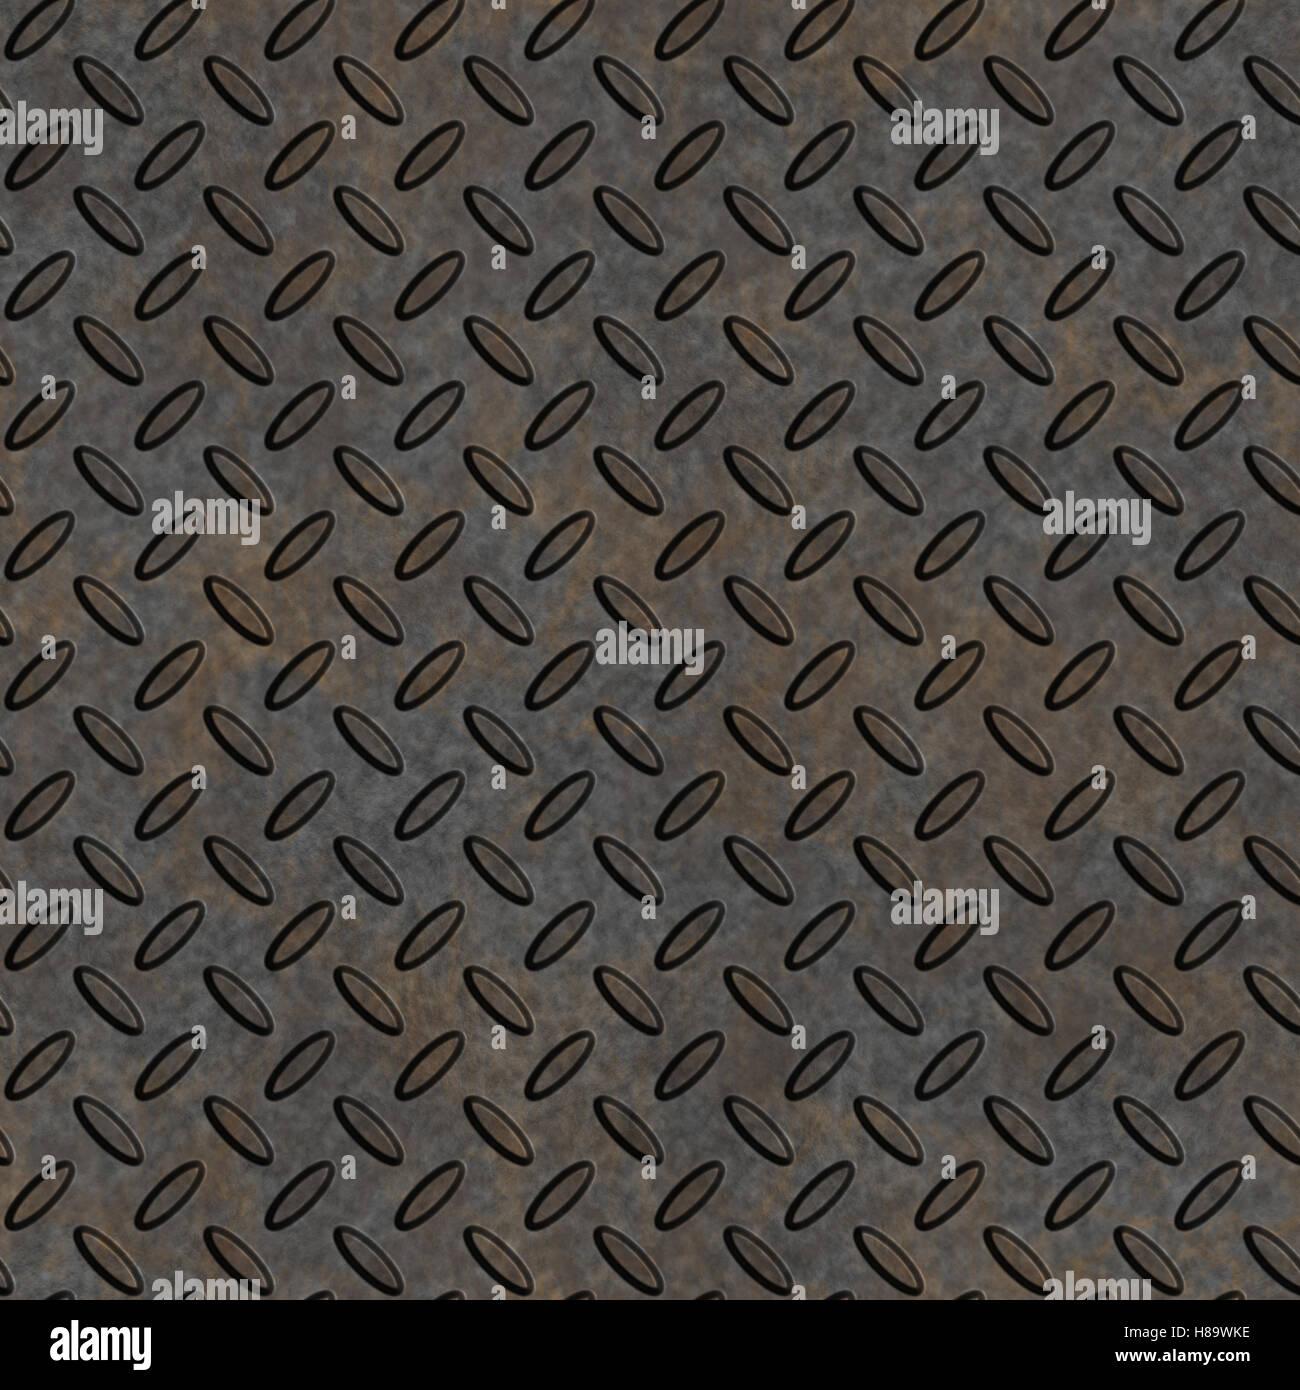 Metal textura fluida de precisión de alta resolución patrón fondos Imagen De Stock